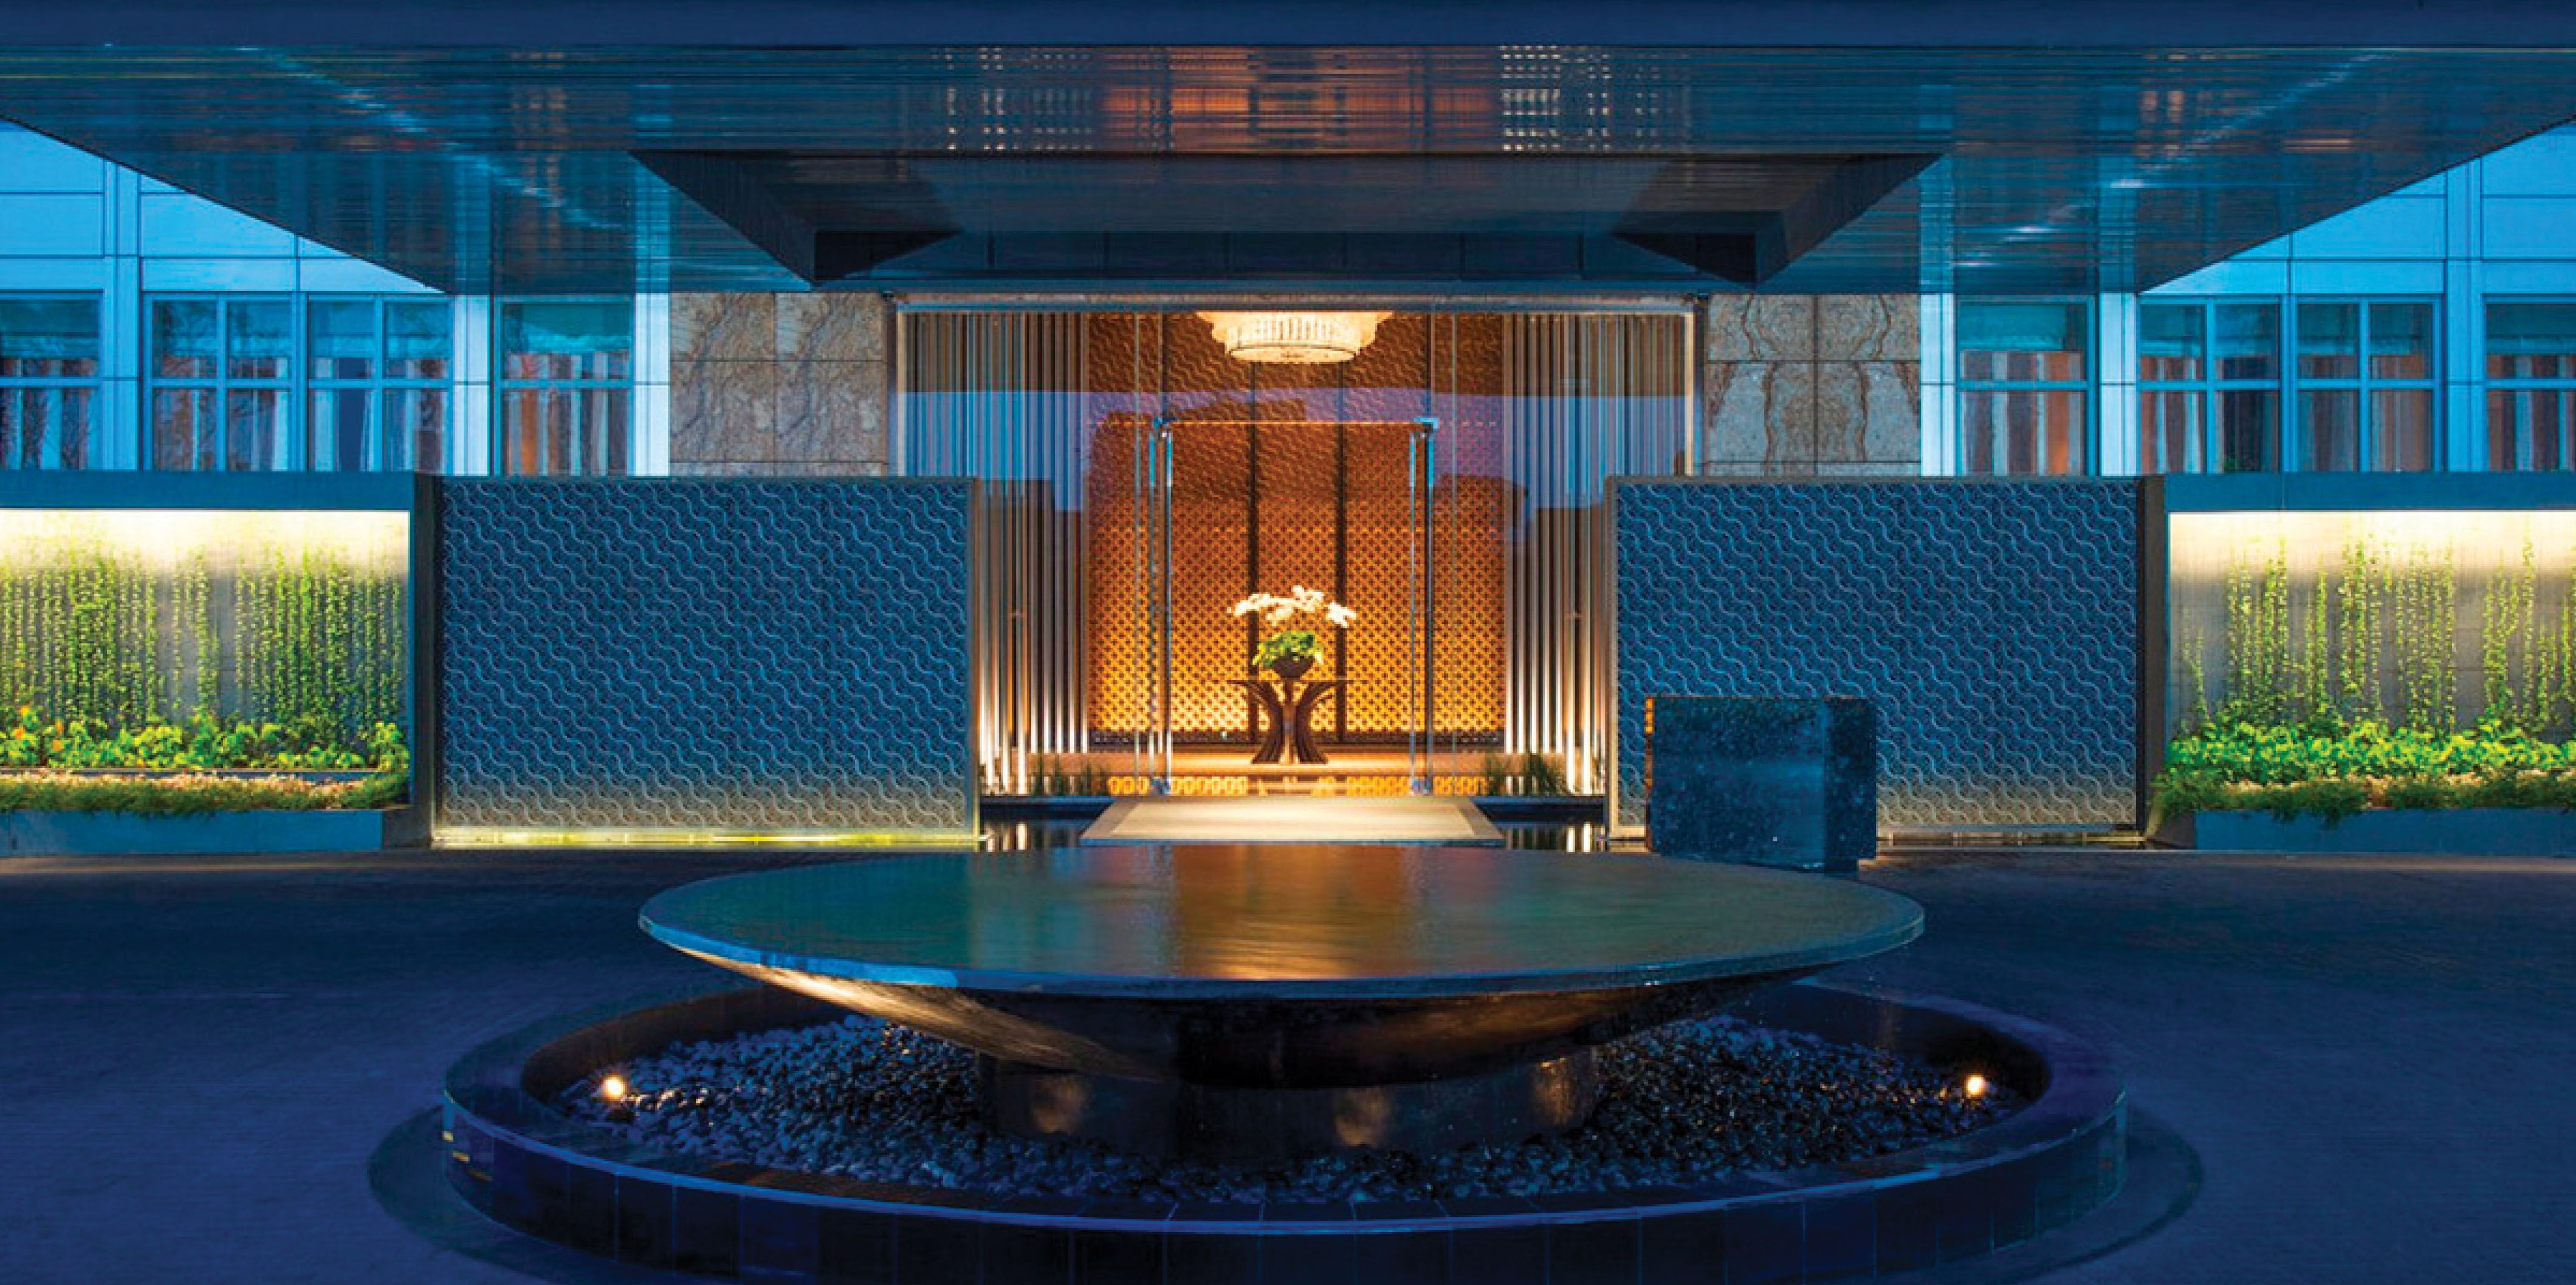 Scda luxury collection keraton indonesia entrance for Hotel entrance decor